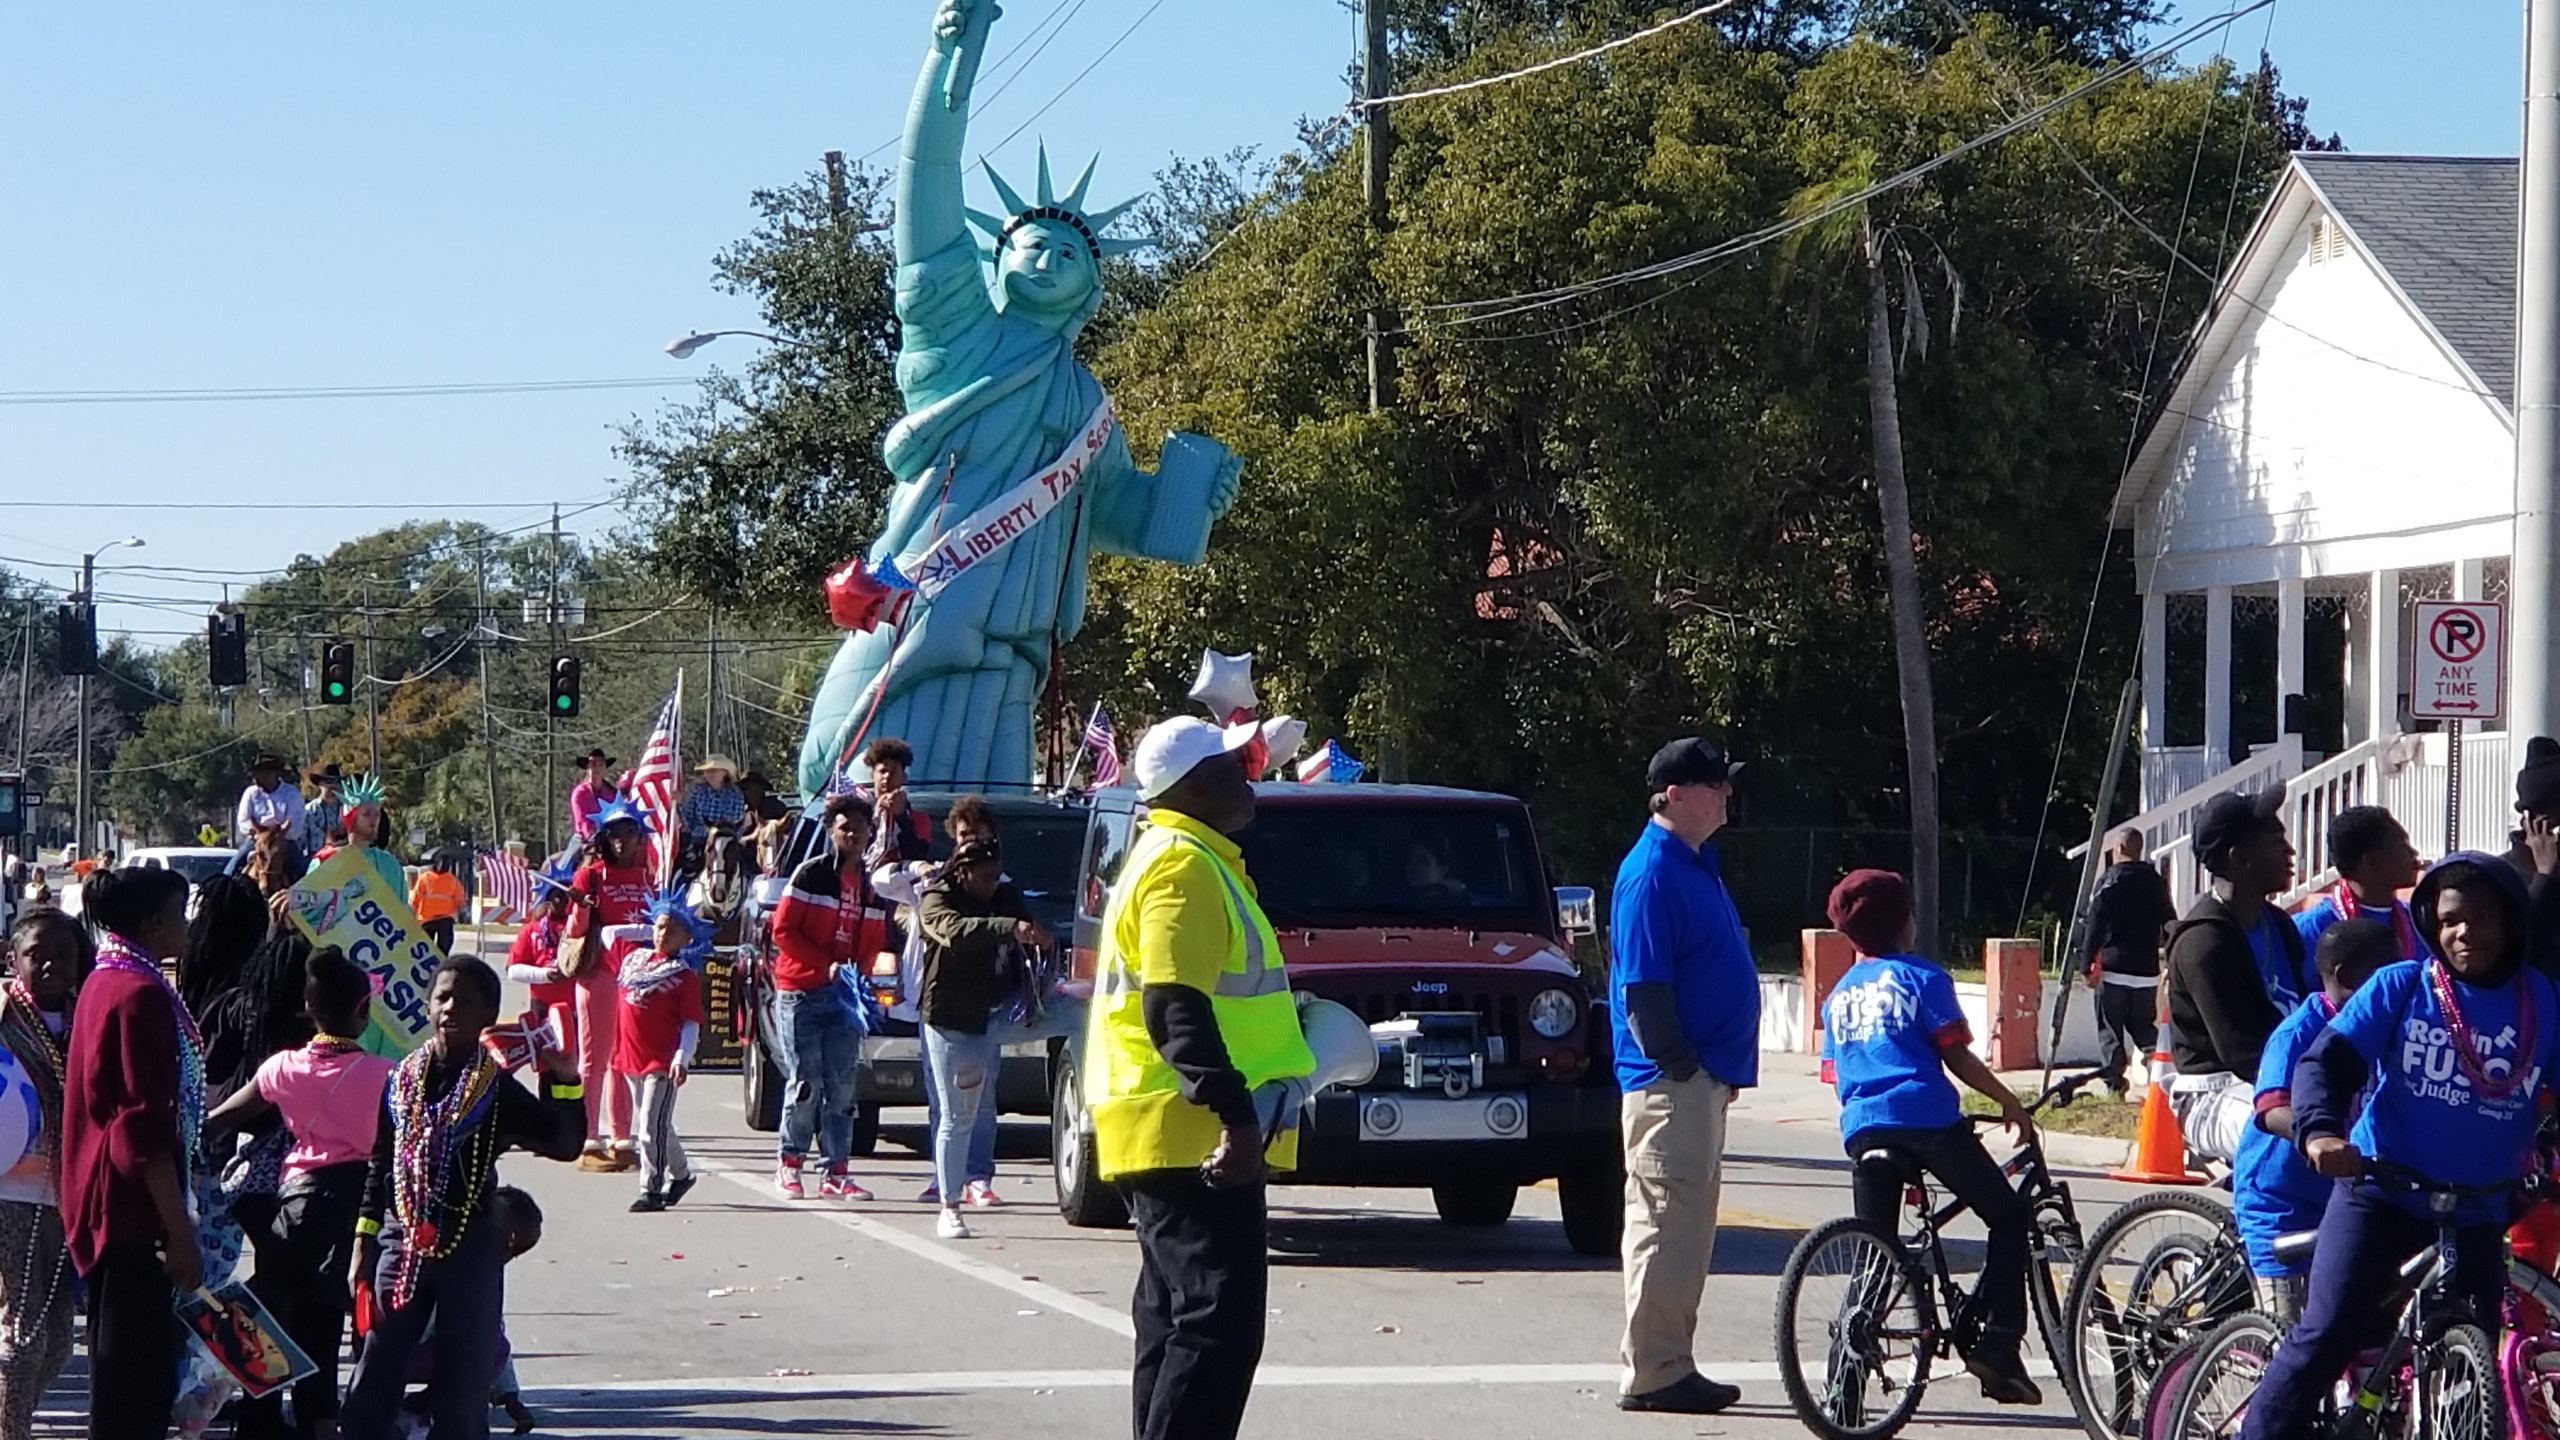 Statue of Liberty Balloon!